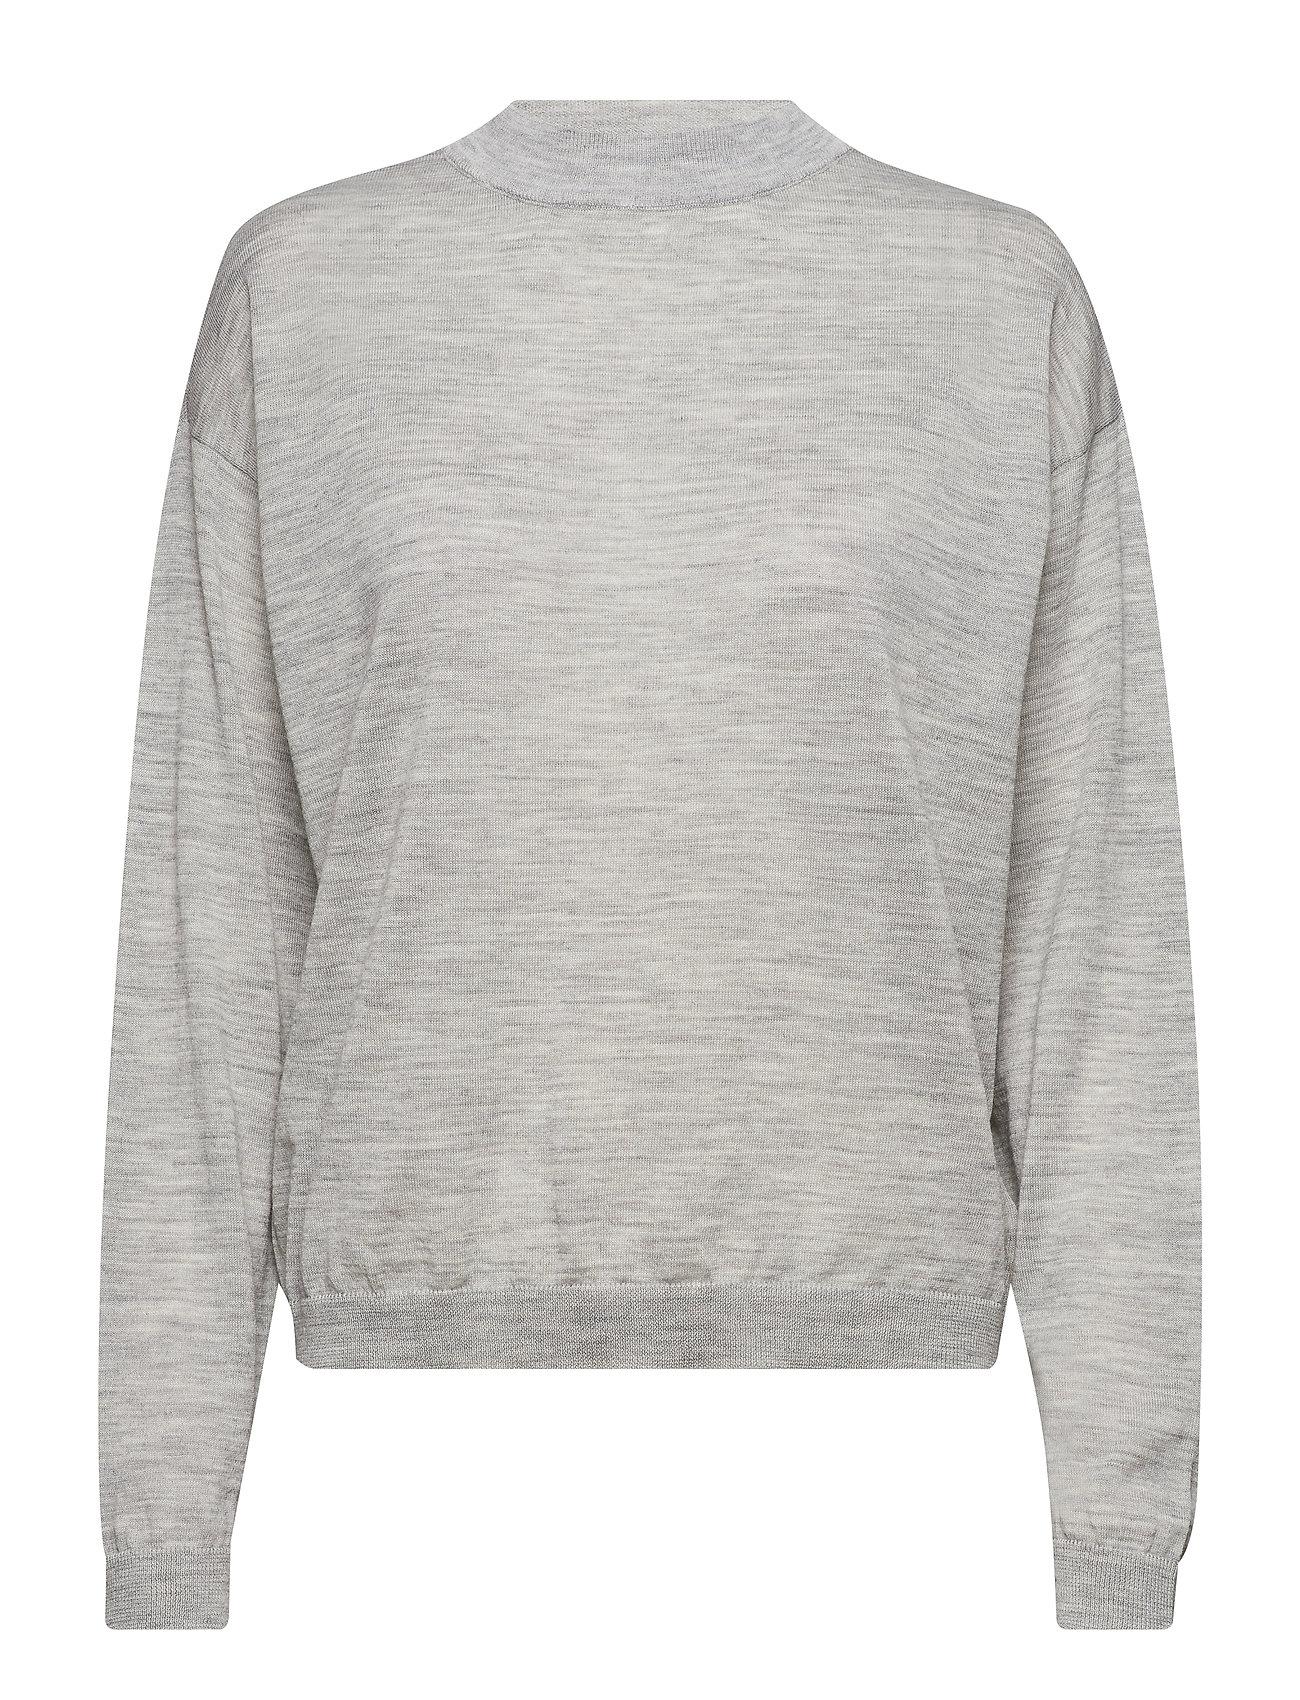 grey grey Merinagz Pulloverl Pulloverl grey MelangeGestuz Pulloverl Merinagz MelangeGestuz Merinagz nNm80wv